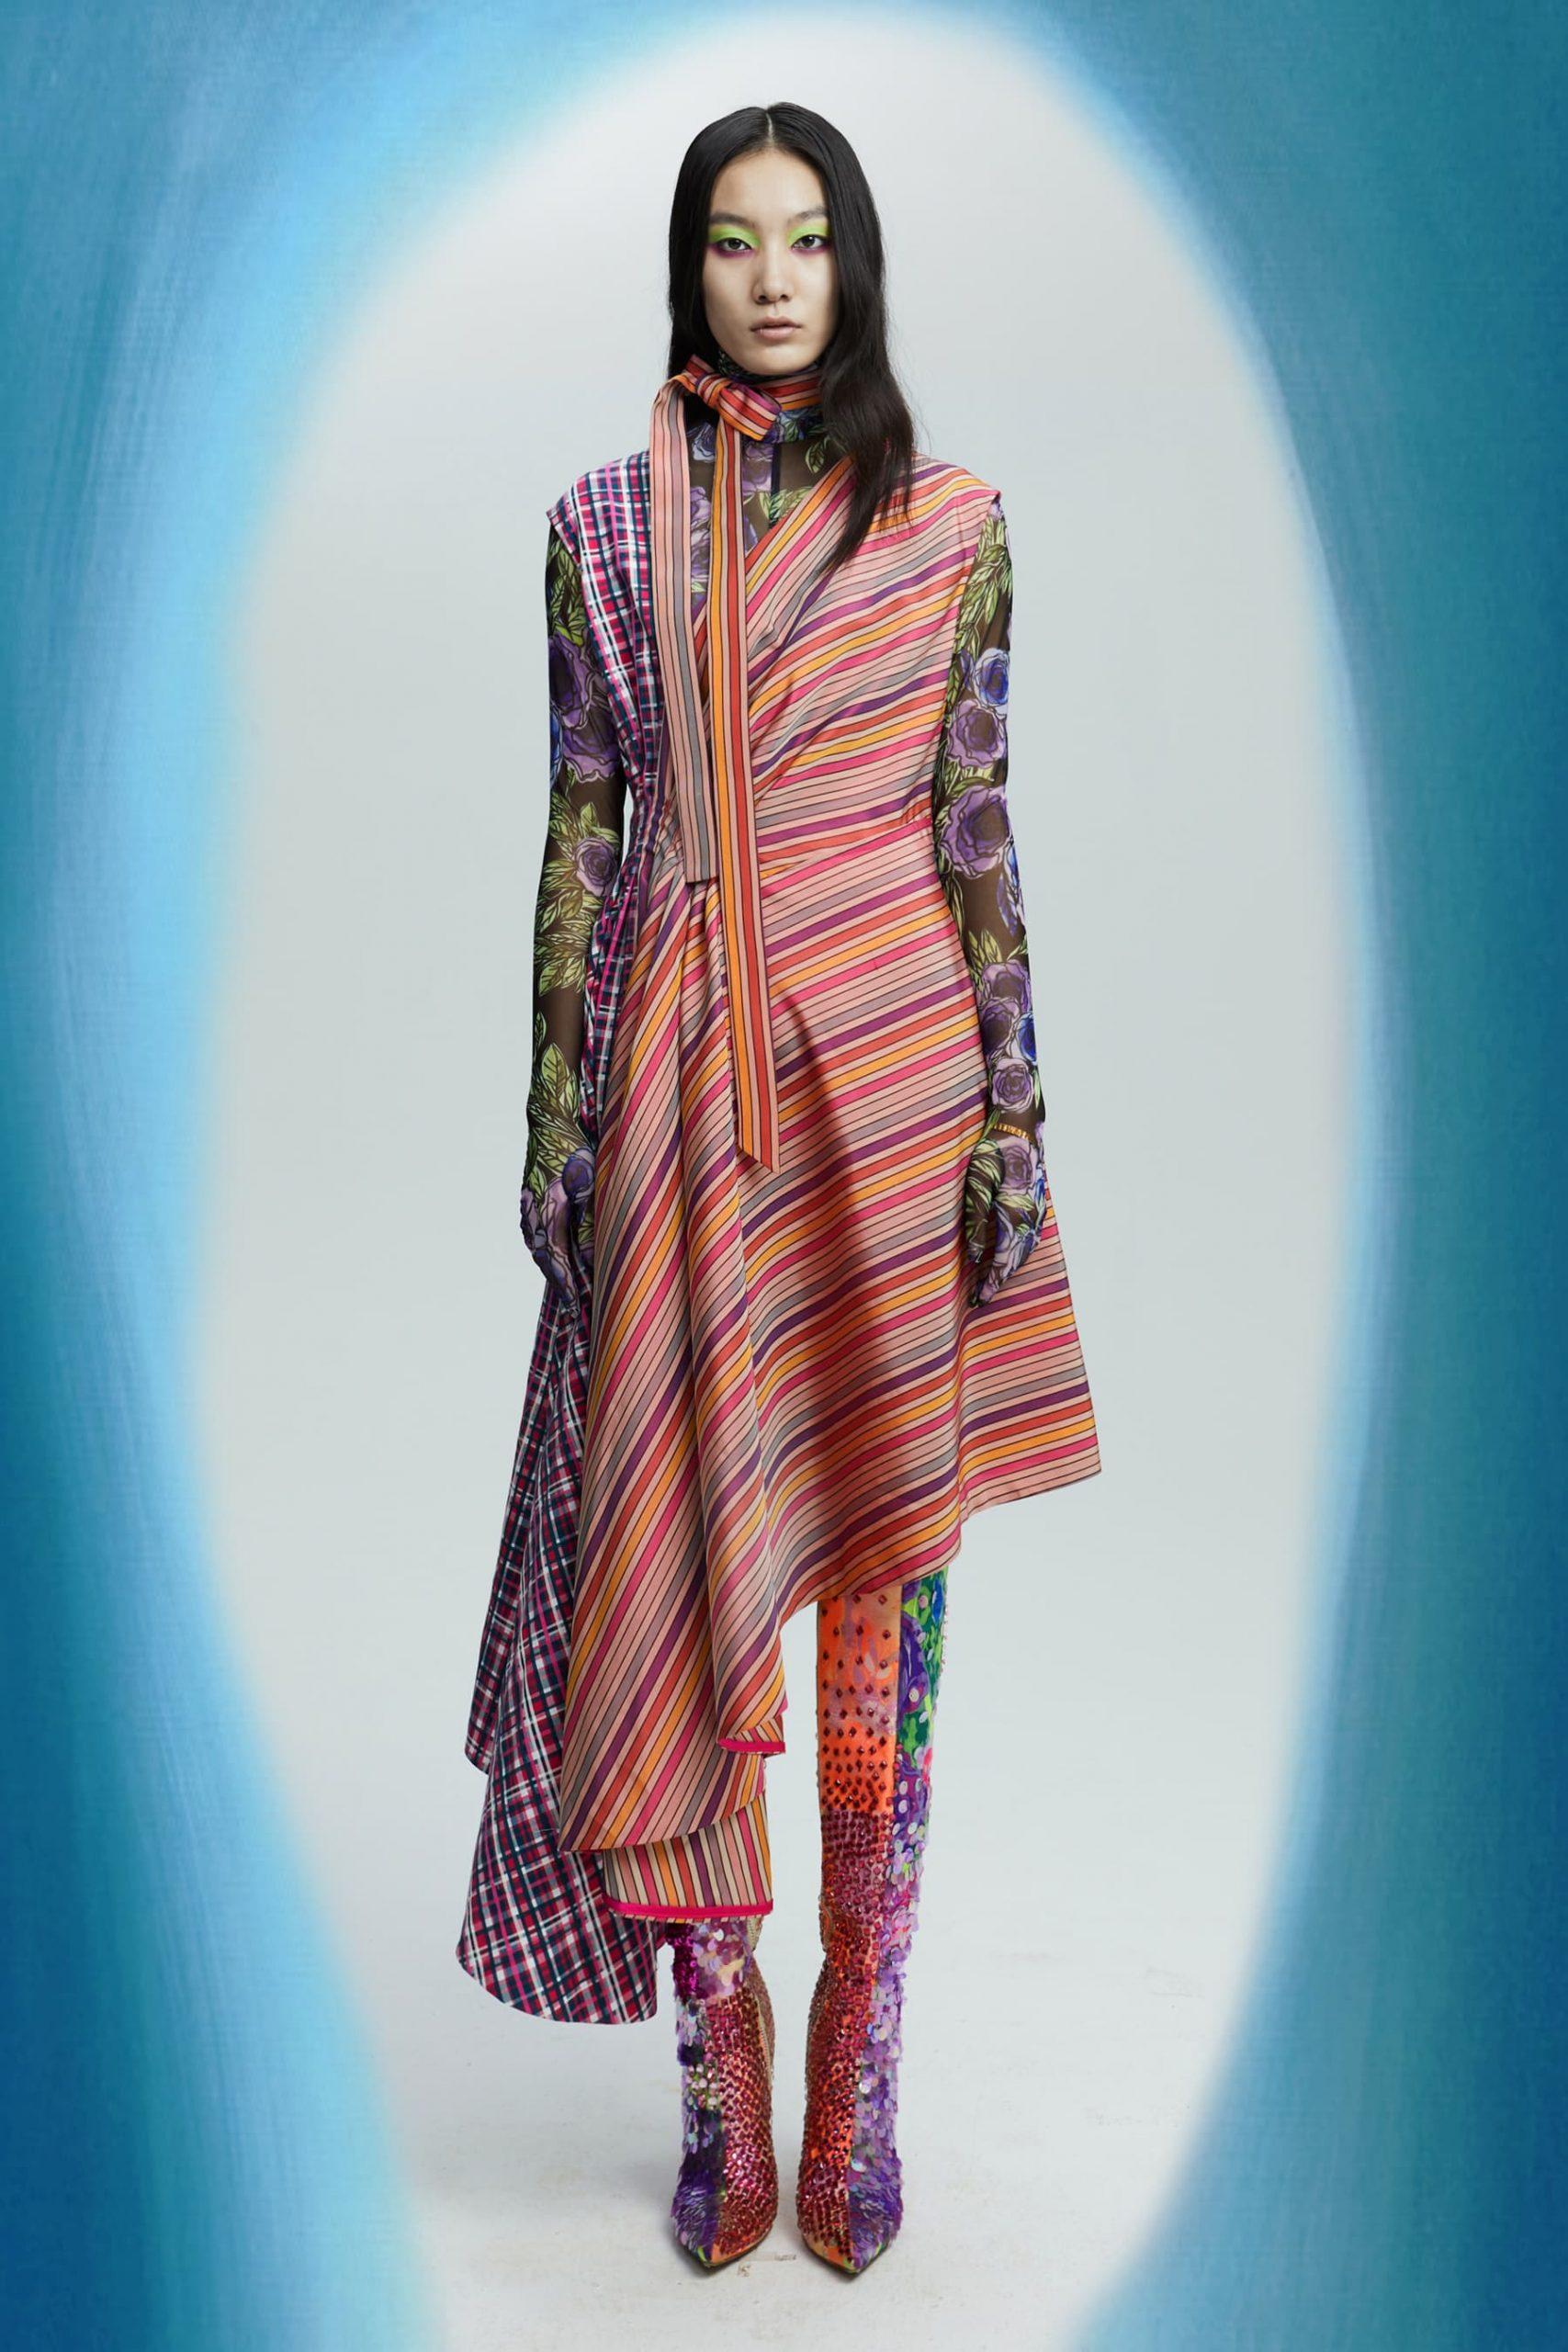 Shuting Qiu, Dsquared2, MM6 Maison Margiela, Emilio Pucci, & Philipp Plein Fall 2021 Fashion Show Review